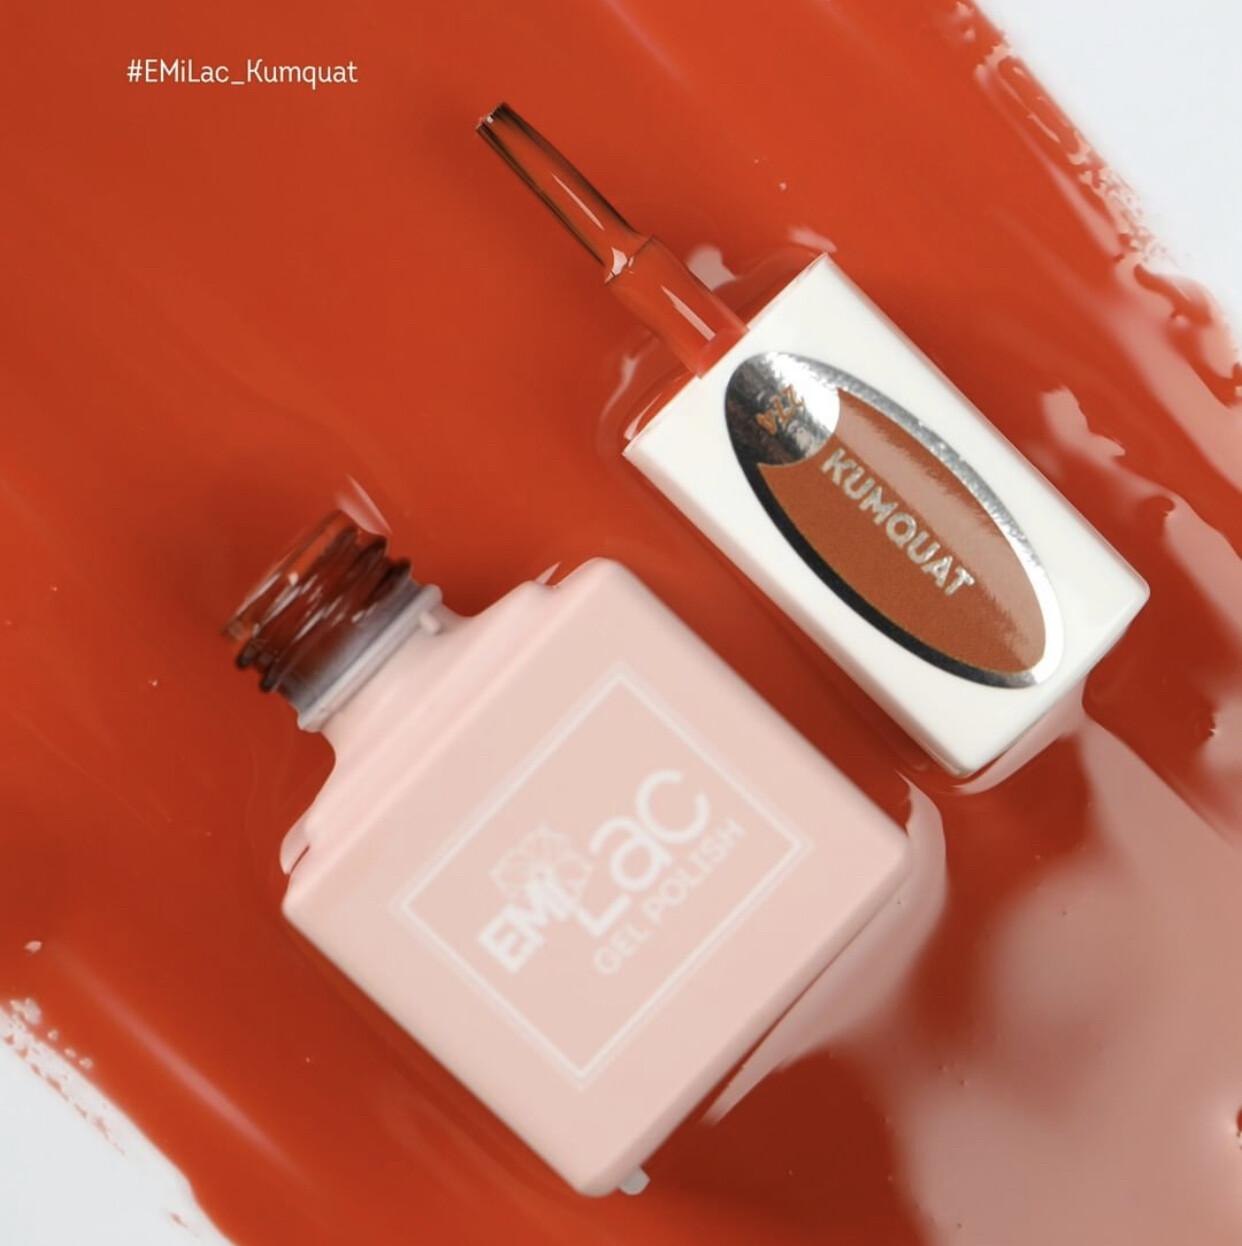 E.MiLac CG Kumquat #274, 9 ml